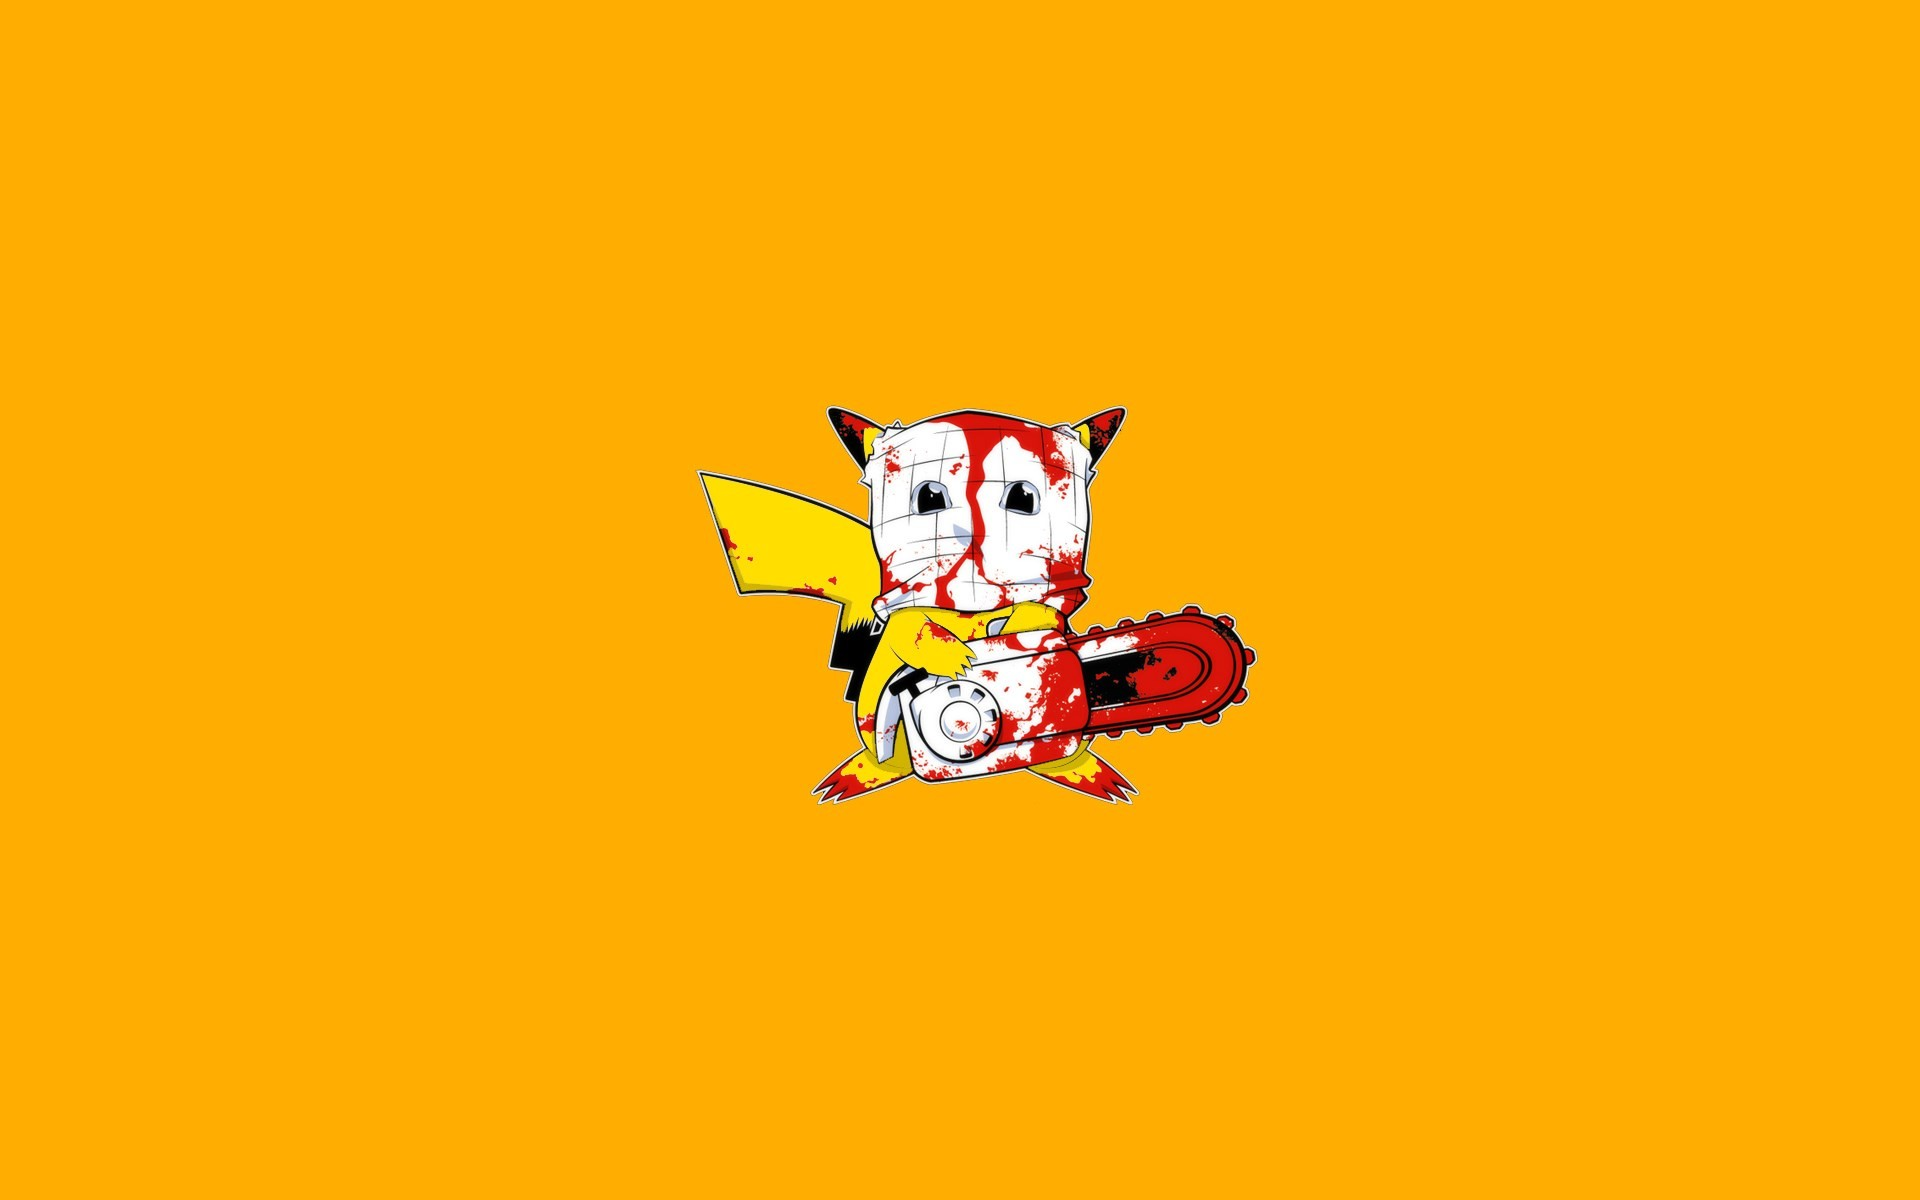 pikachu best wallpapers free